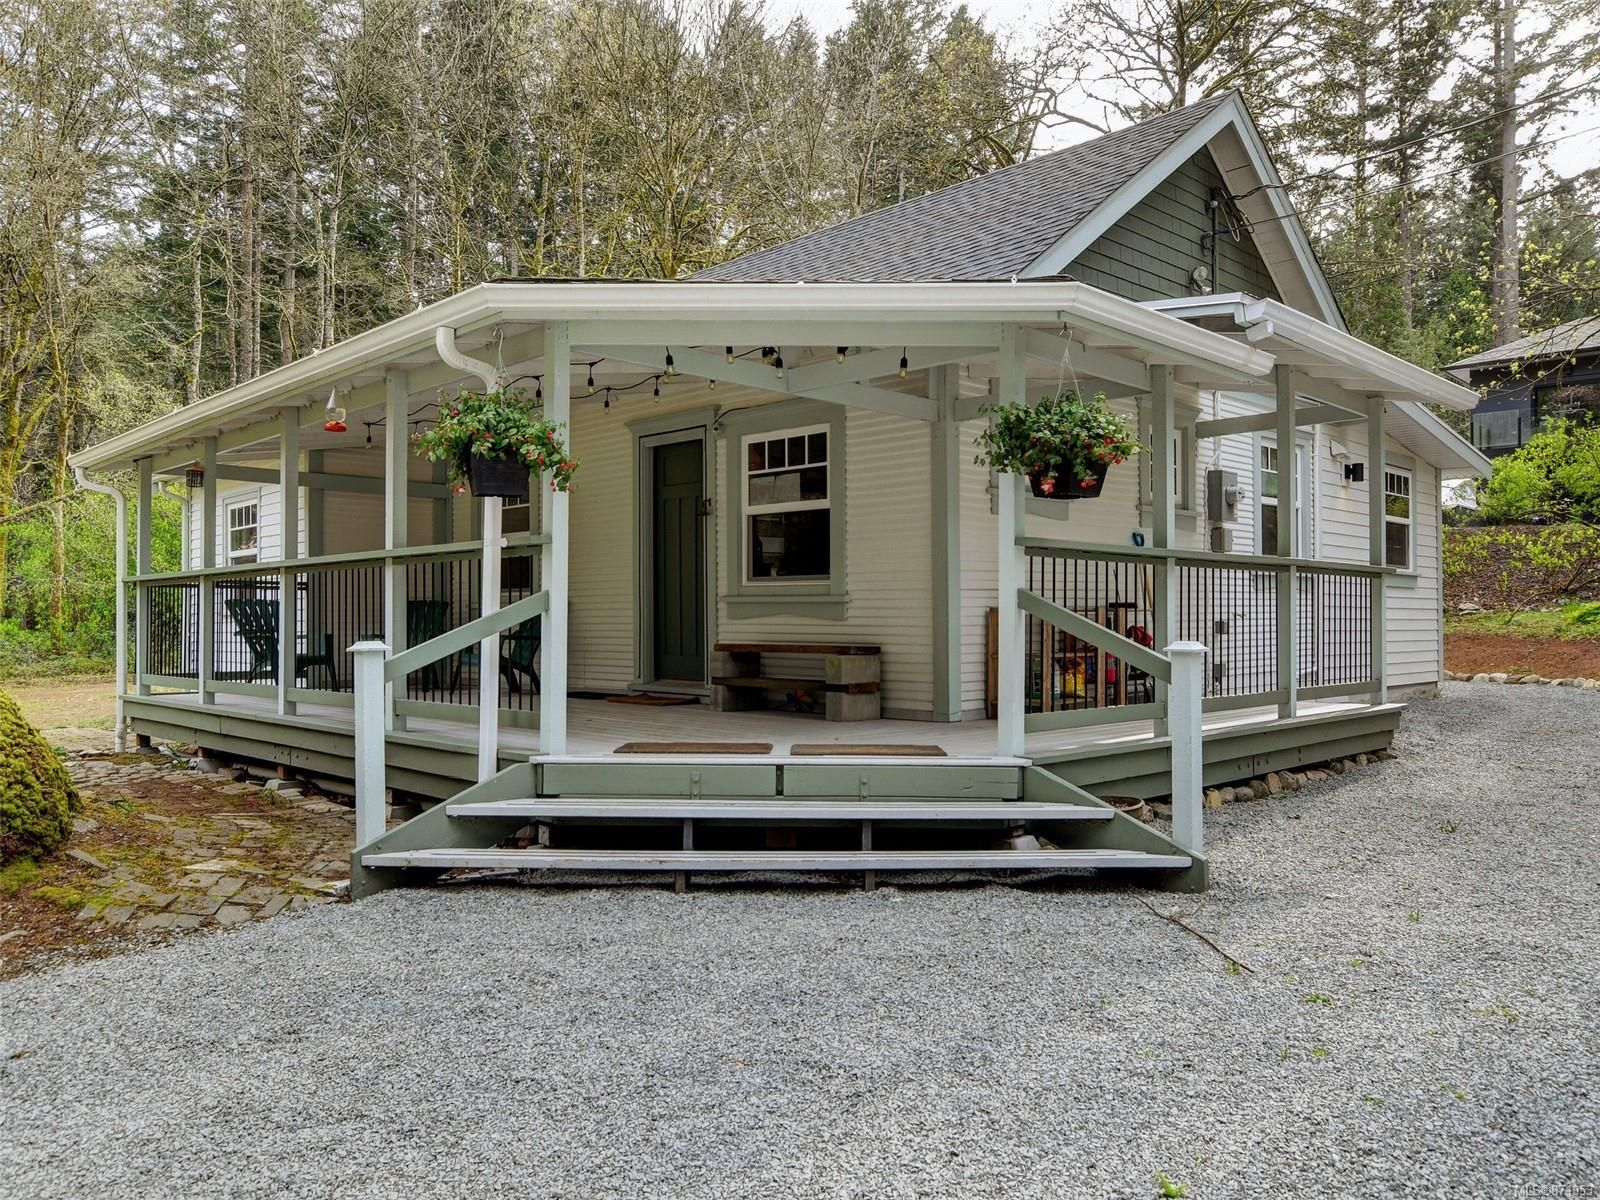 Main Photo: 867 Sayward Rd in : SE Cordova Bay House for sale (Saanich East)  : MLS®# 871953